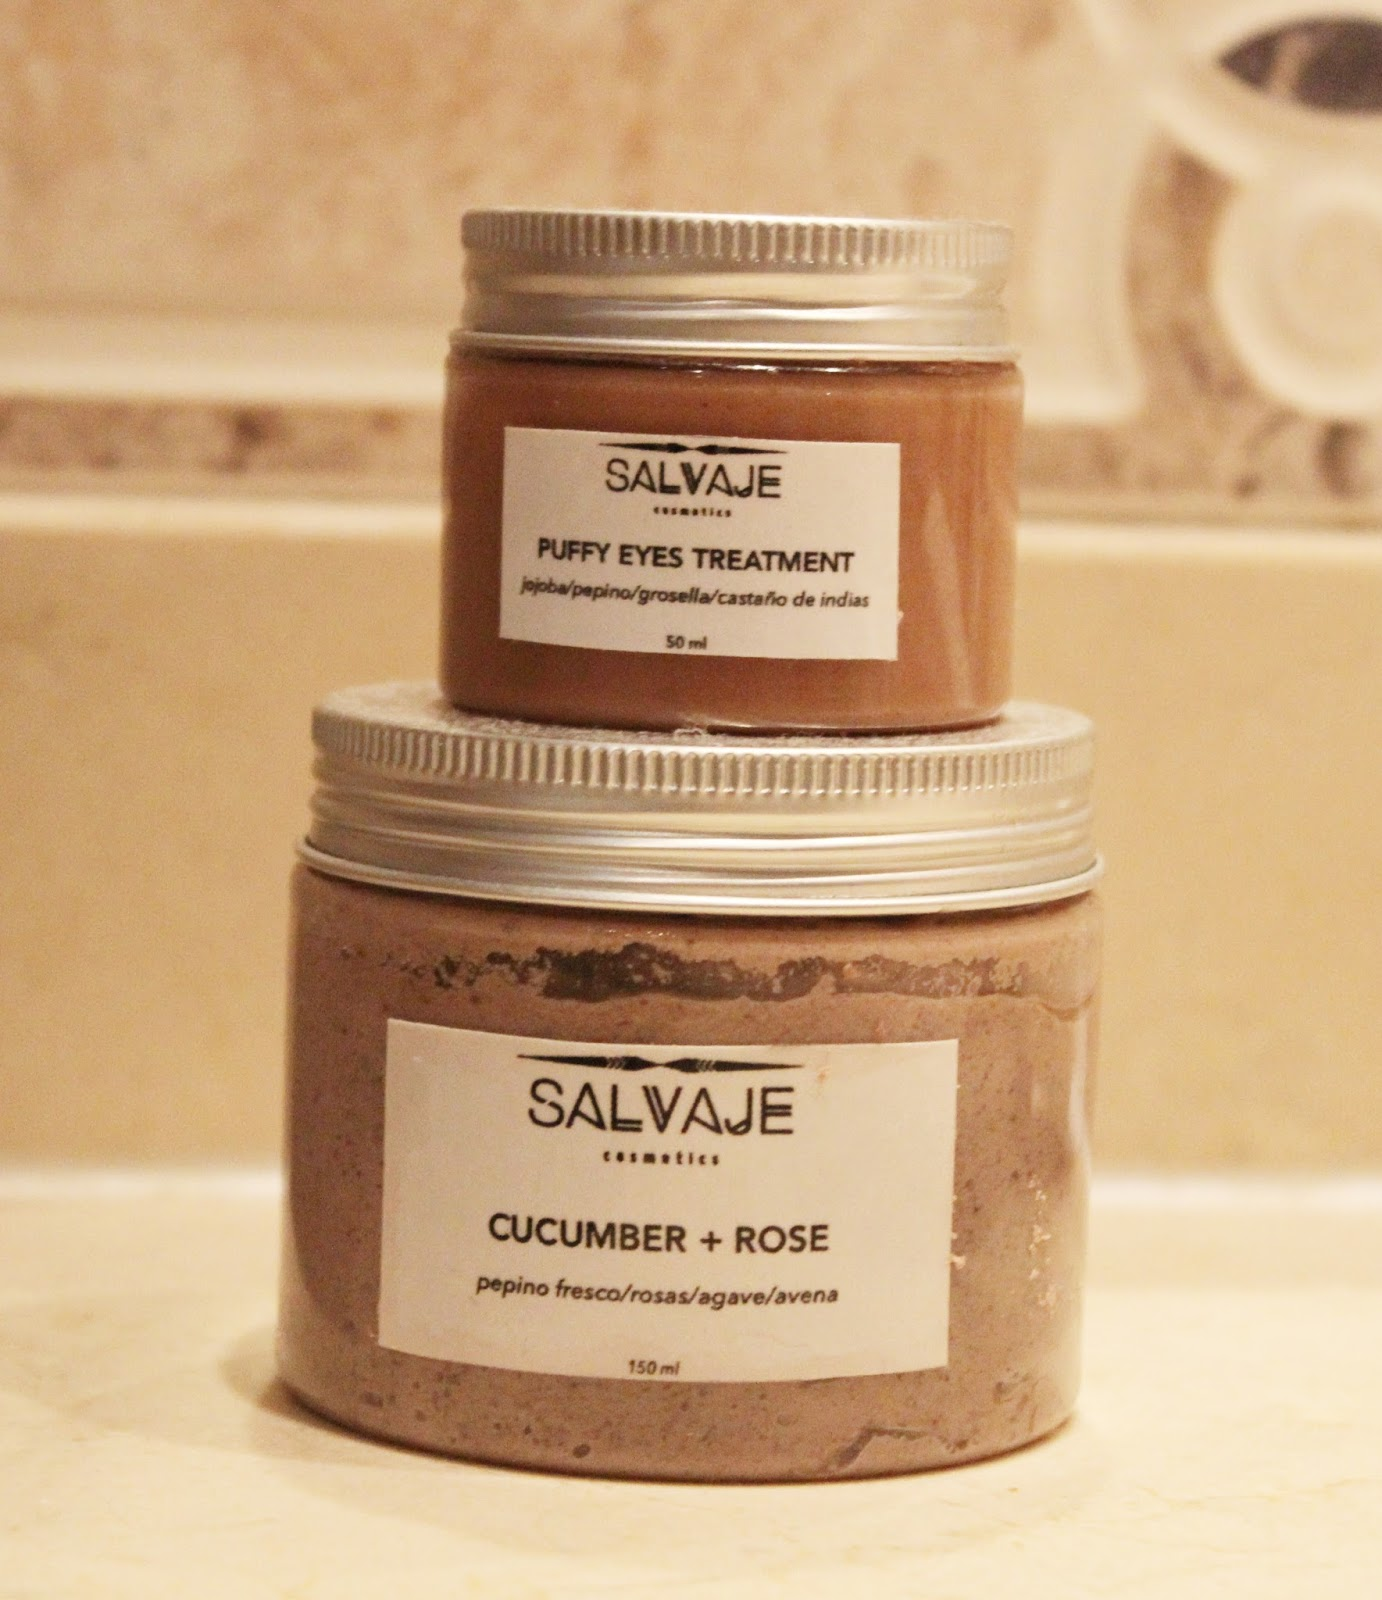 mascarillas faciales orgánicas 10 productos de belleza